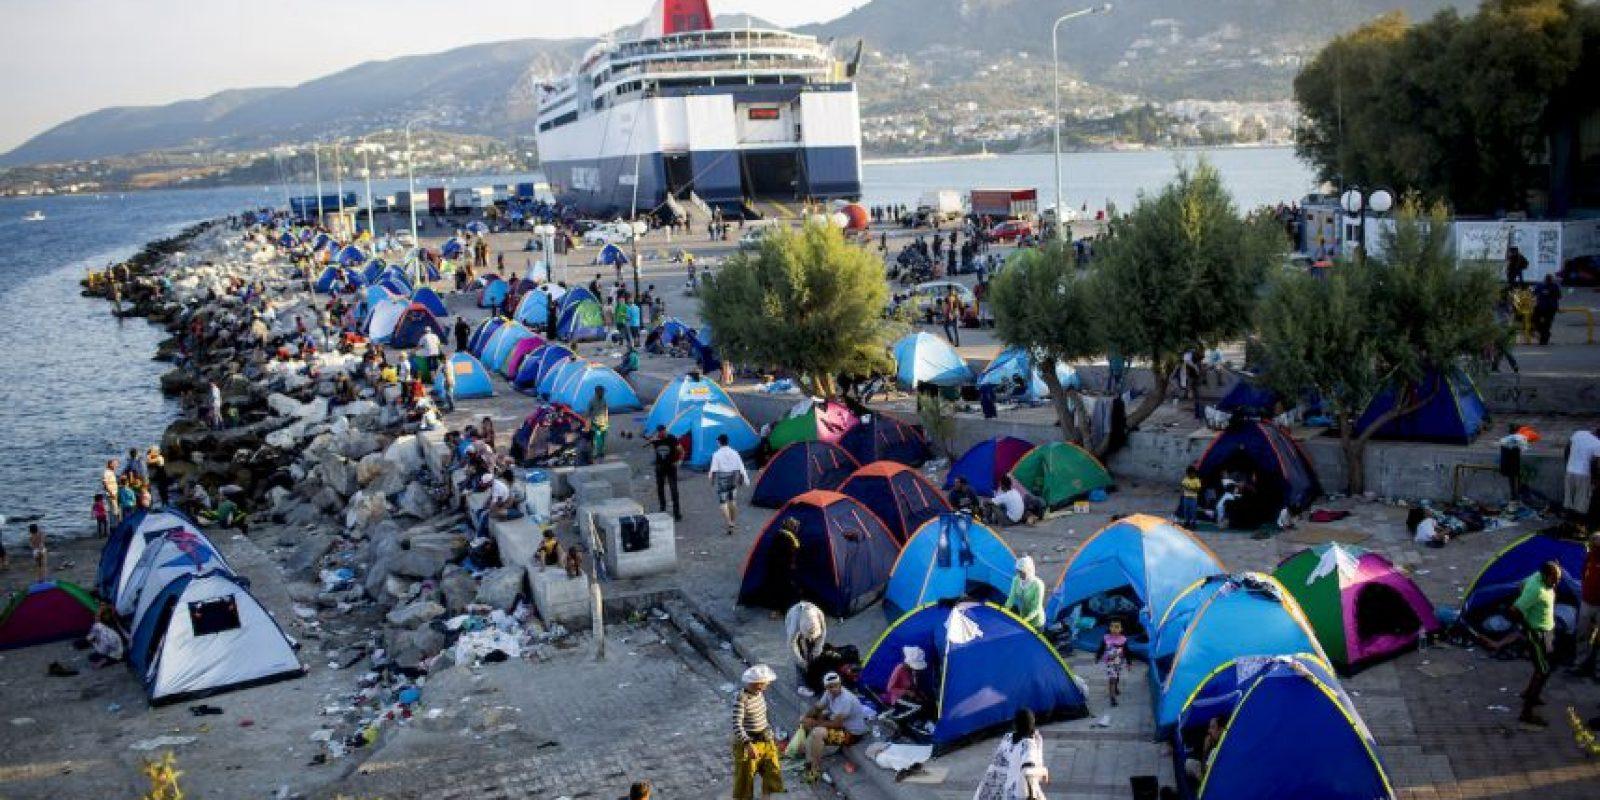 Múltiples países de Europa han acogido refugiados sirios. Foto:Getty Images